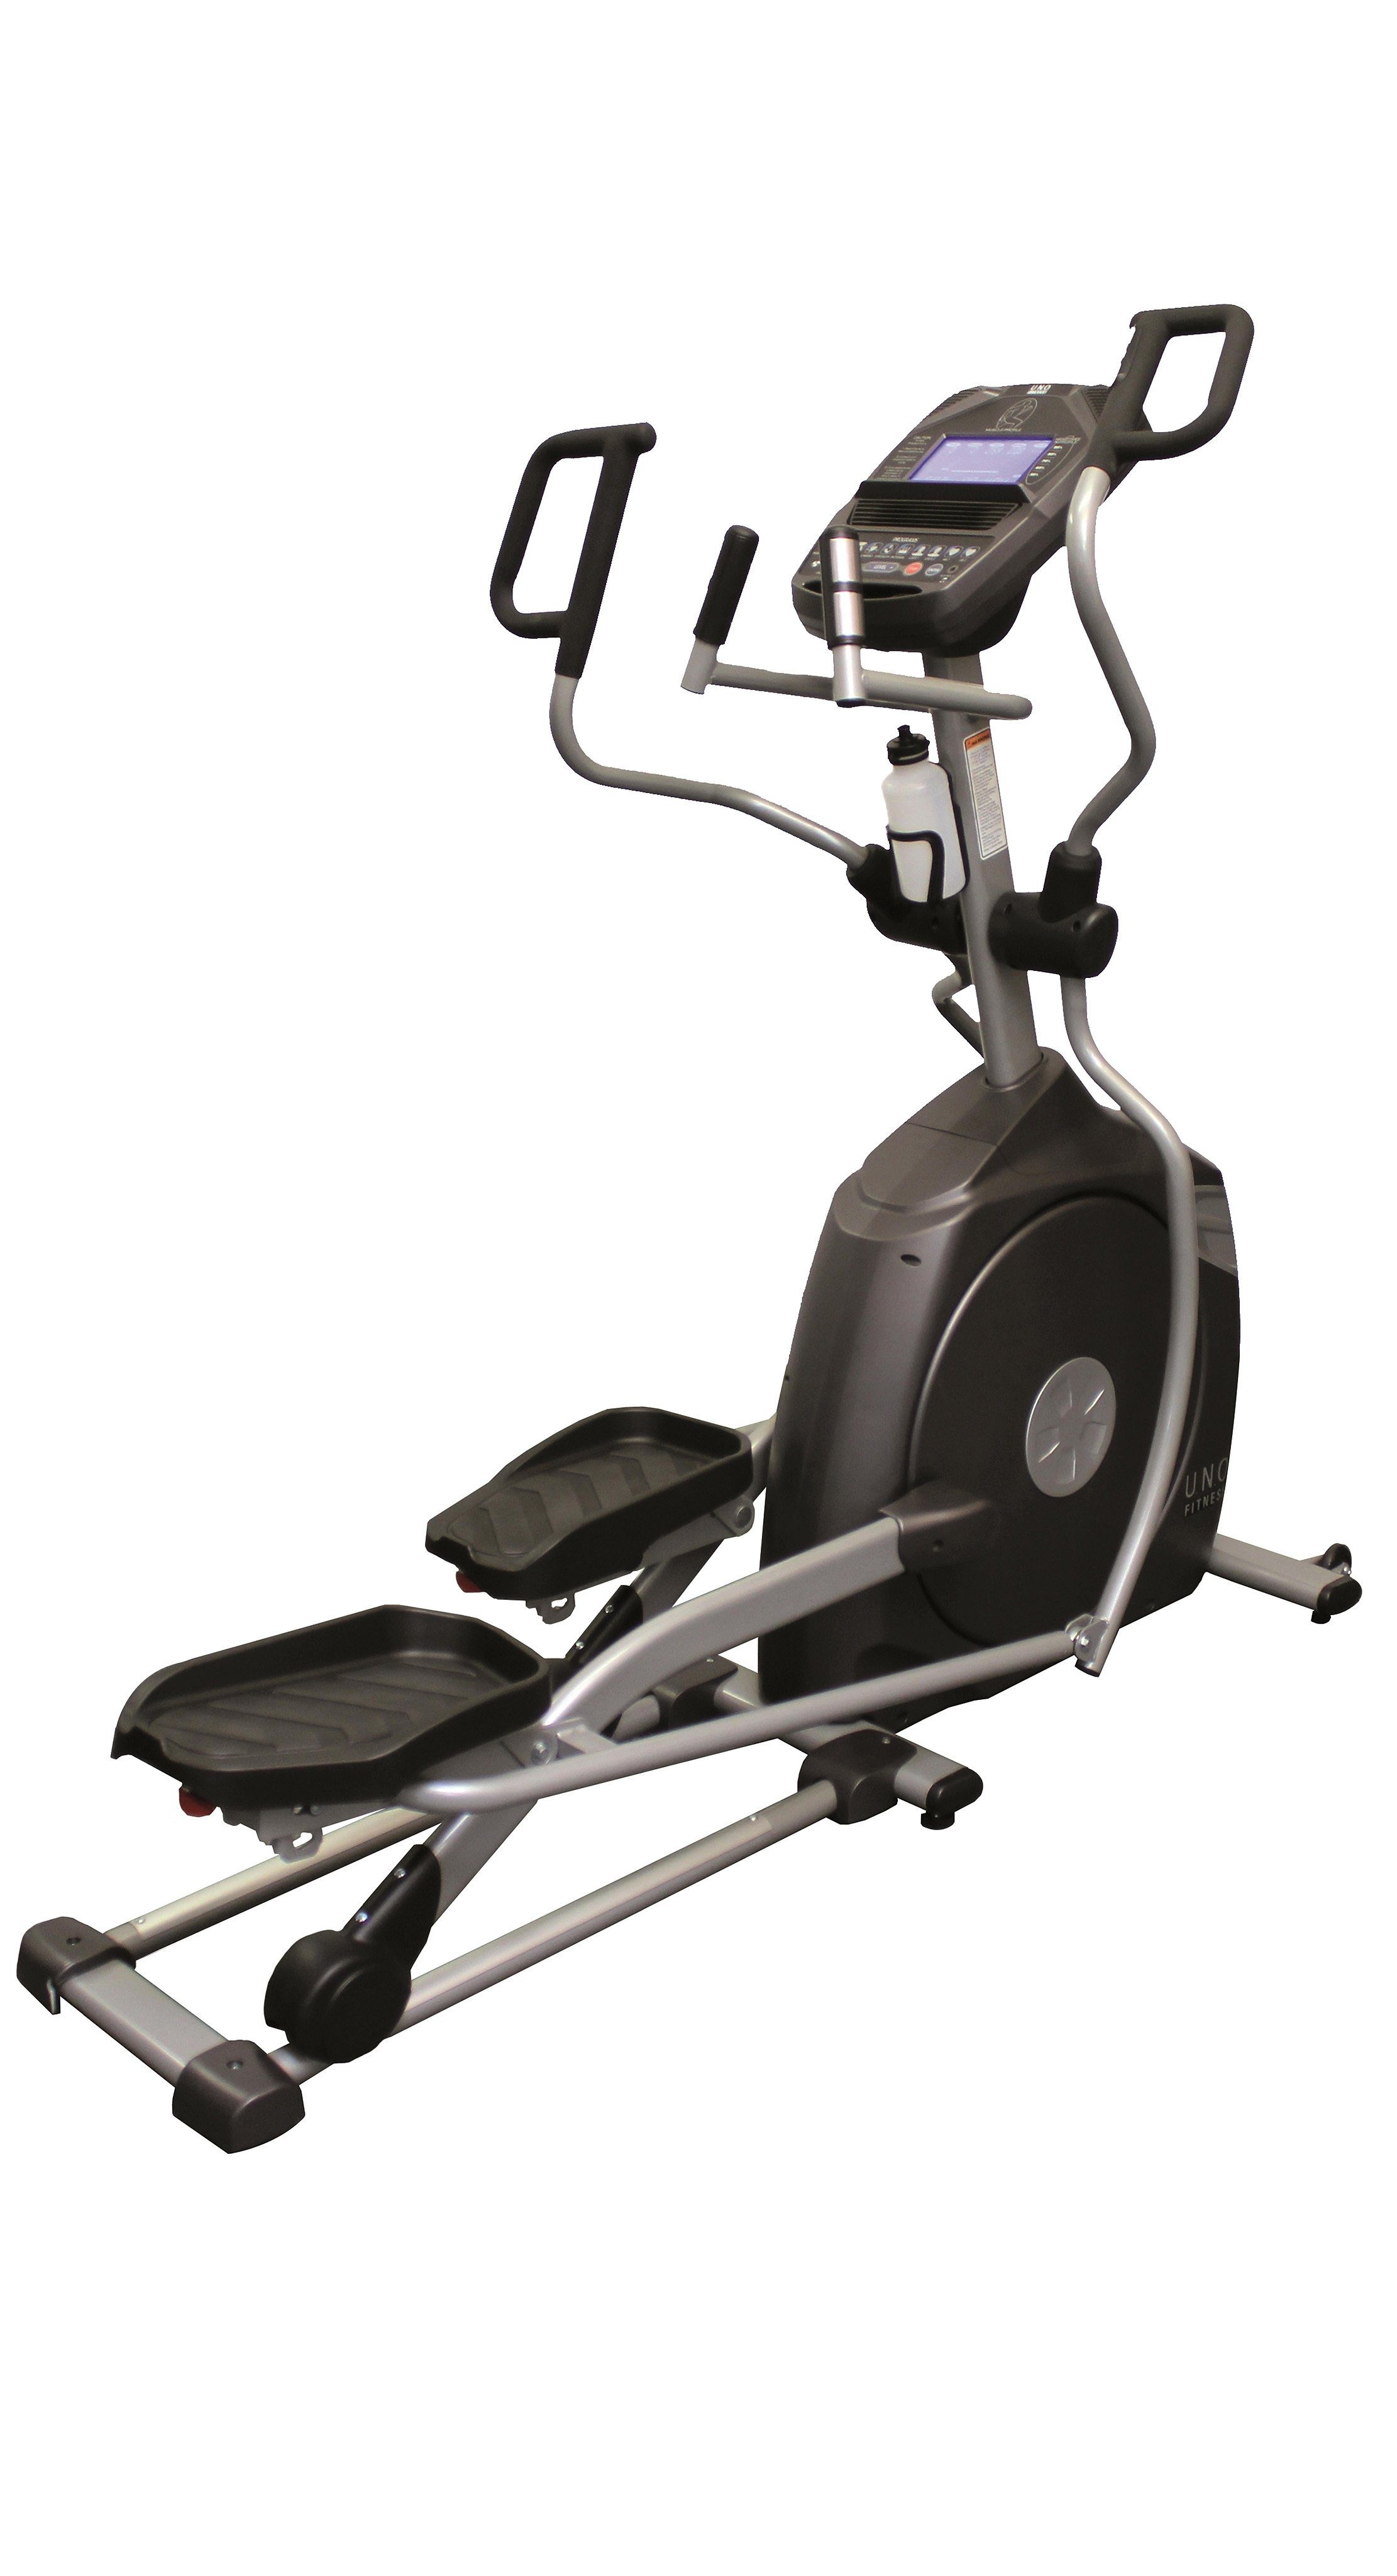 UNO FITNESS Crosstrainer-Ergometer Crosstrainer XE 50 Preisvergleich